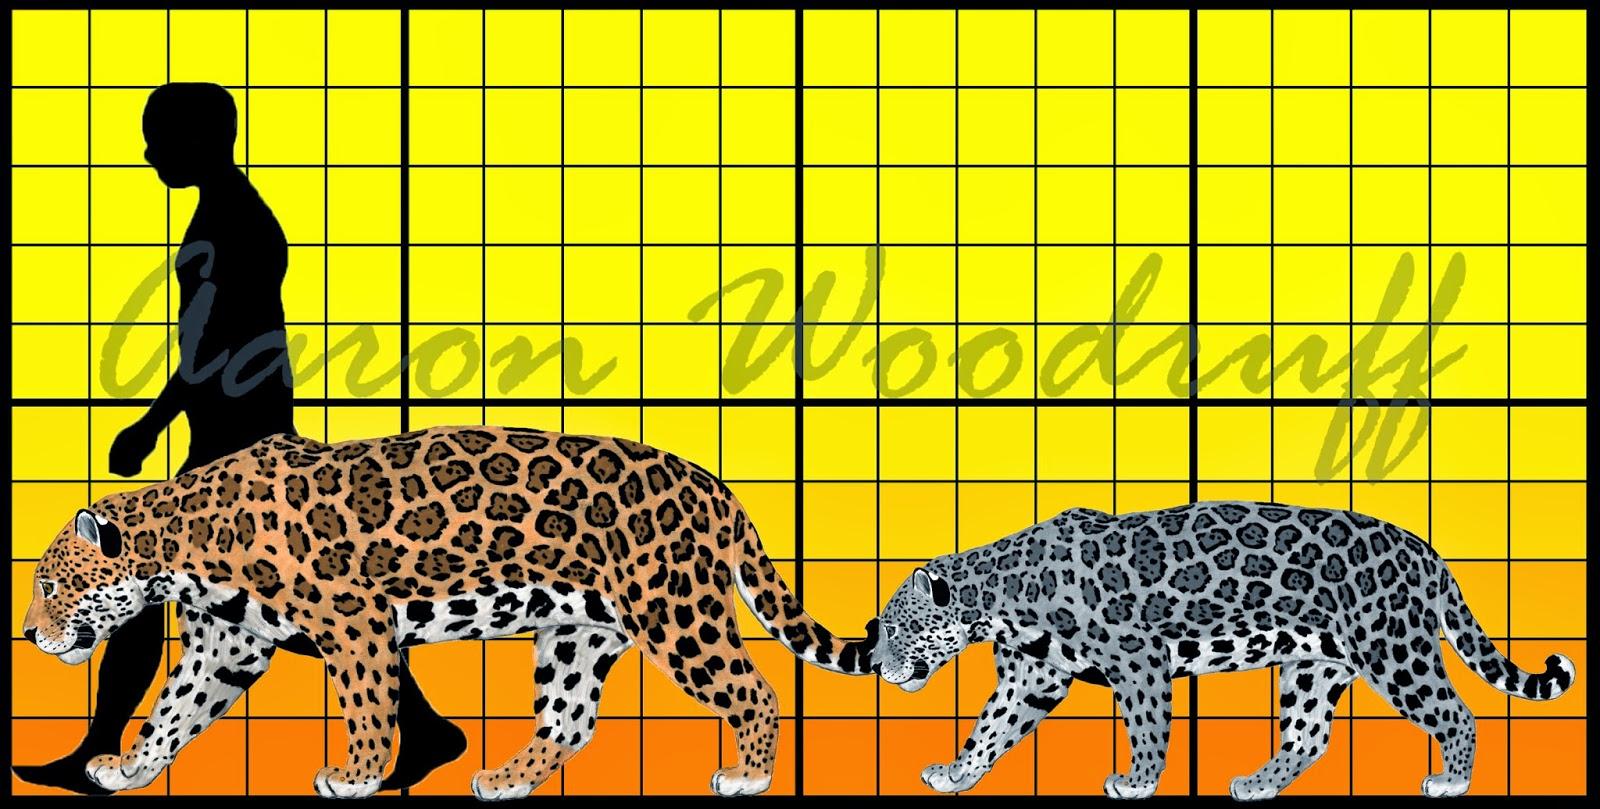 Life In The Cenozoic Era Jaguar Panthera Onca